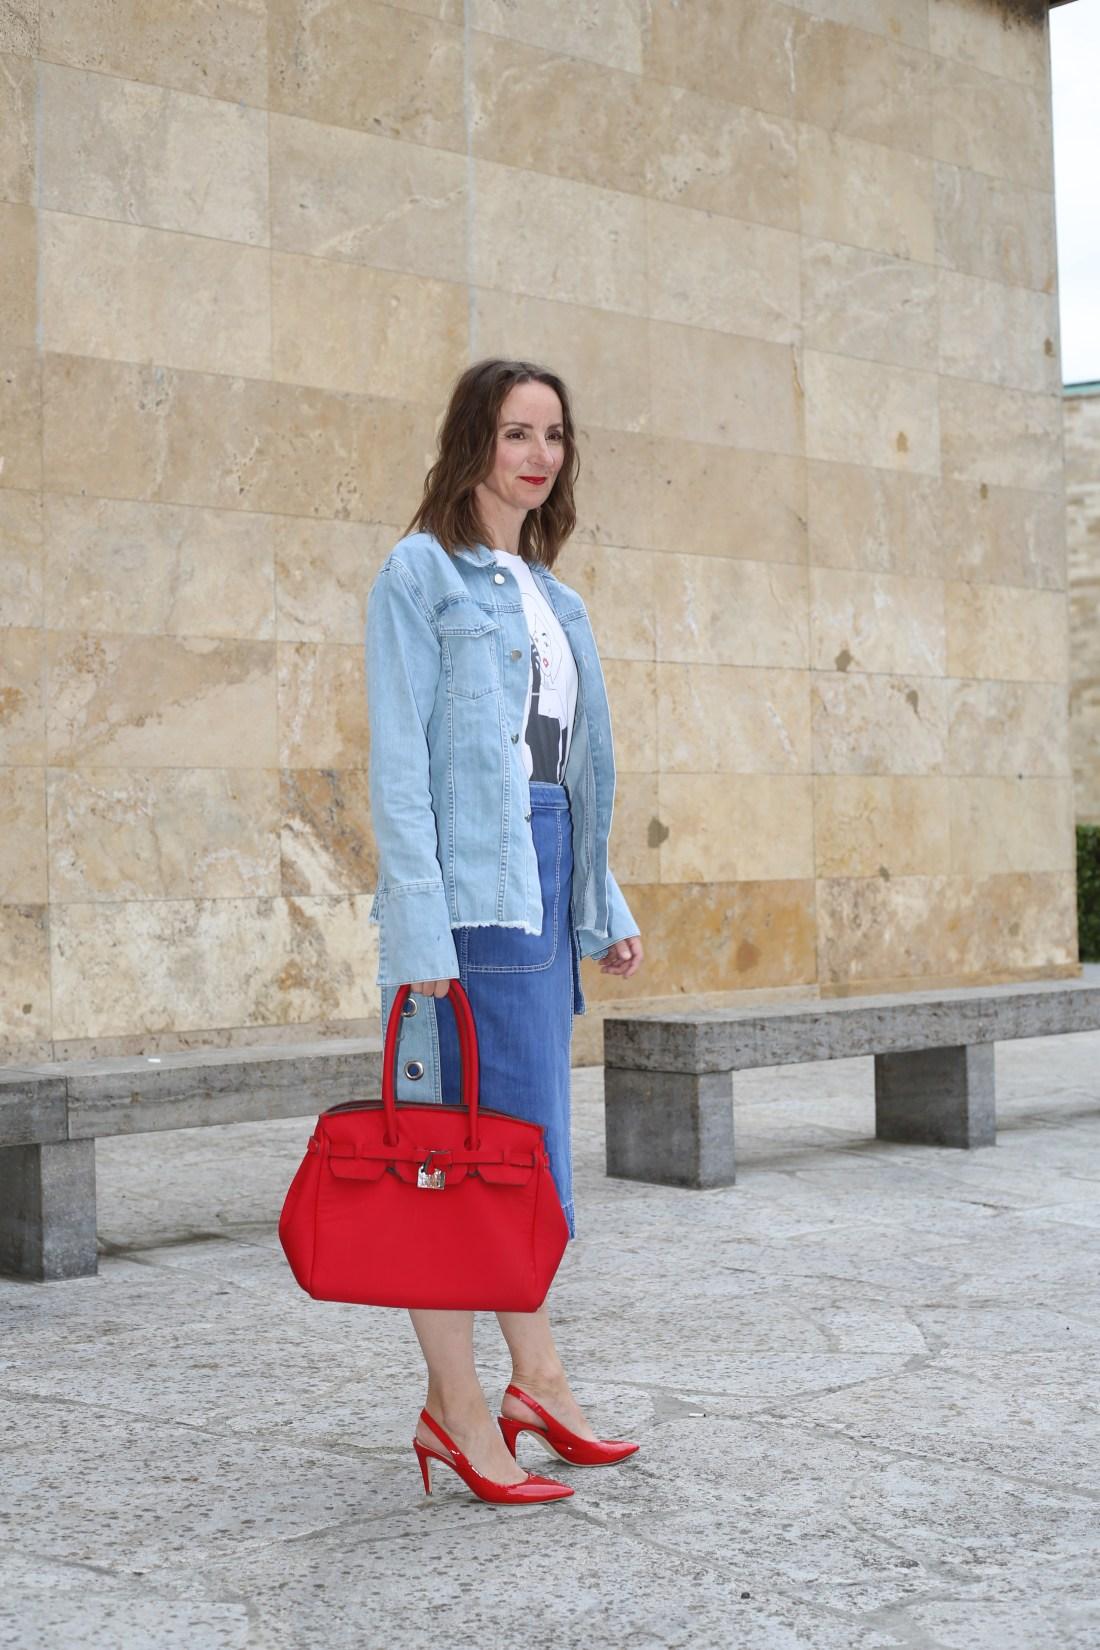 weite-hose_streifen_faltenrock_streifenbluse_slingback-pumps_rot_mode-blog-ü40_Oceanblue-style_jeansjacke_denim_neopren_birkin-bag_wrapped_denim-skirt_wickelrock_jeans (8)